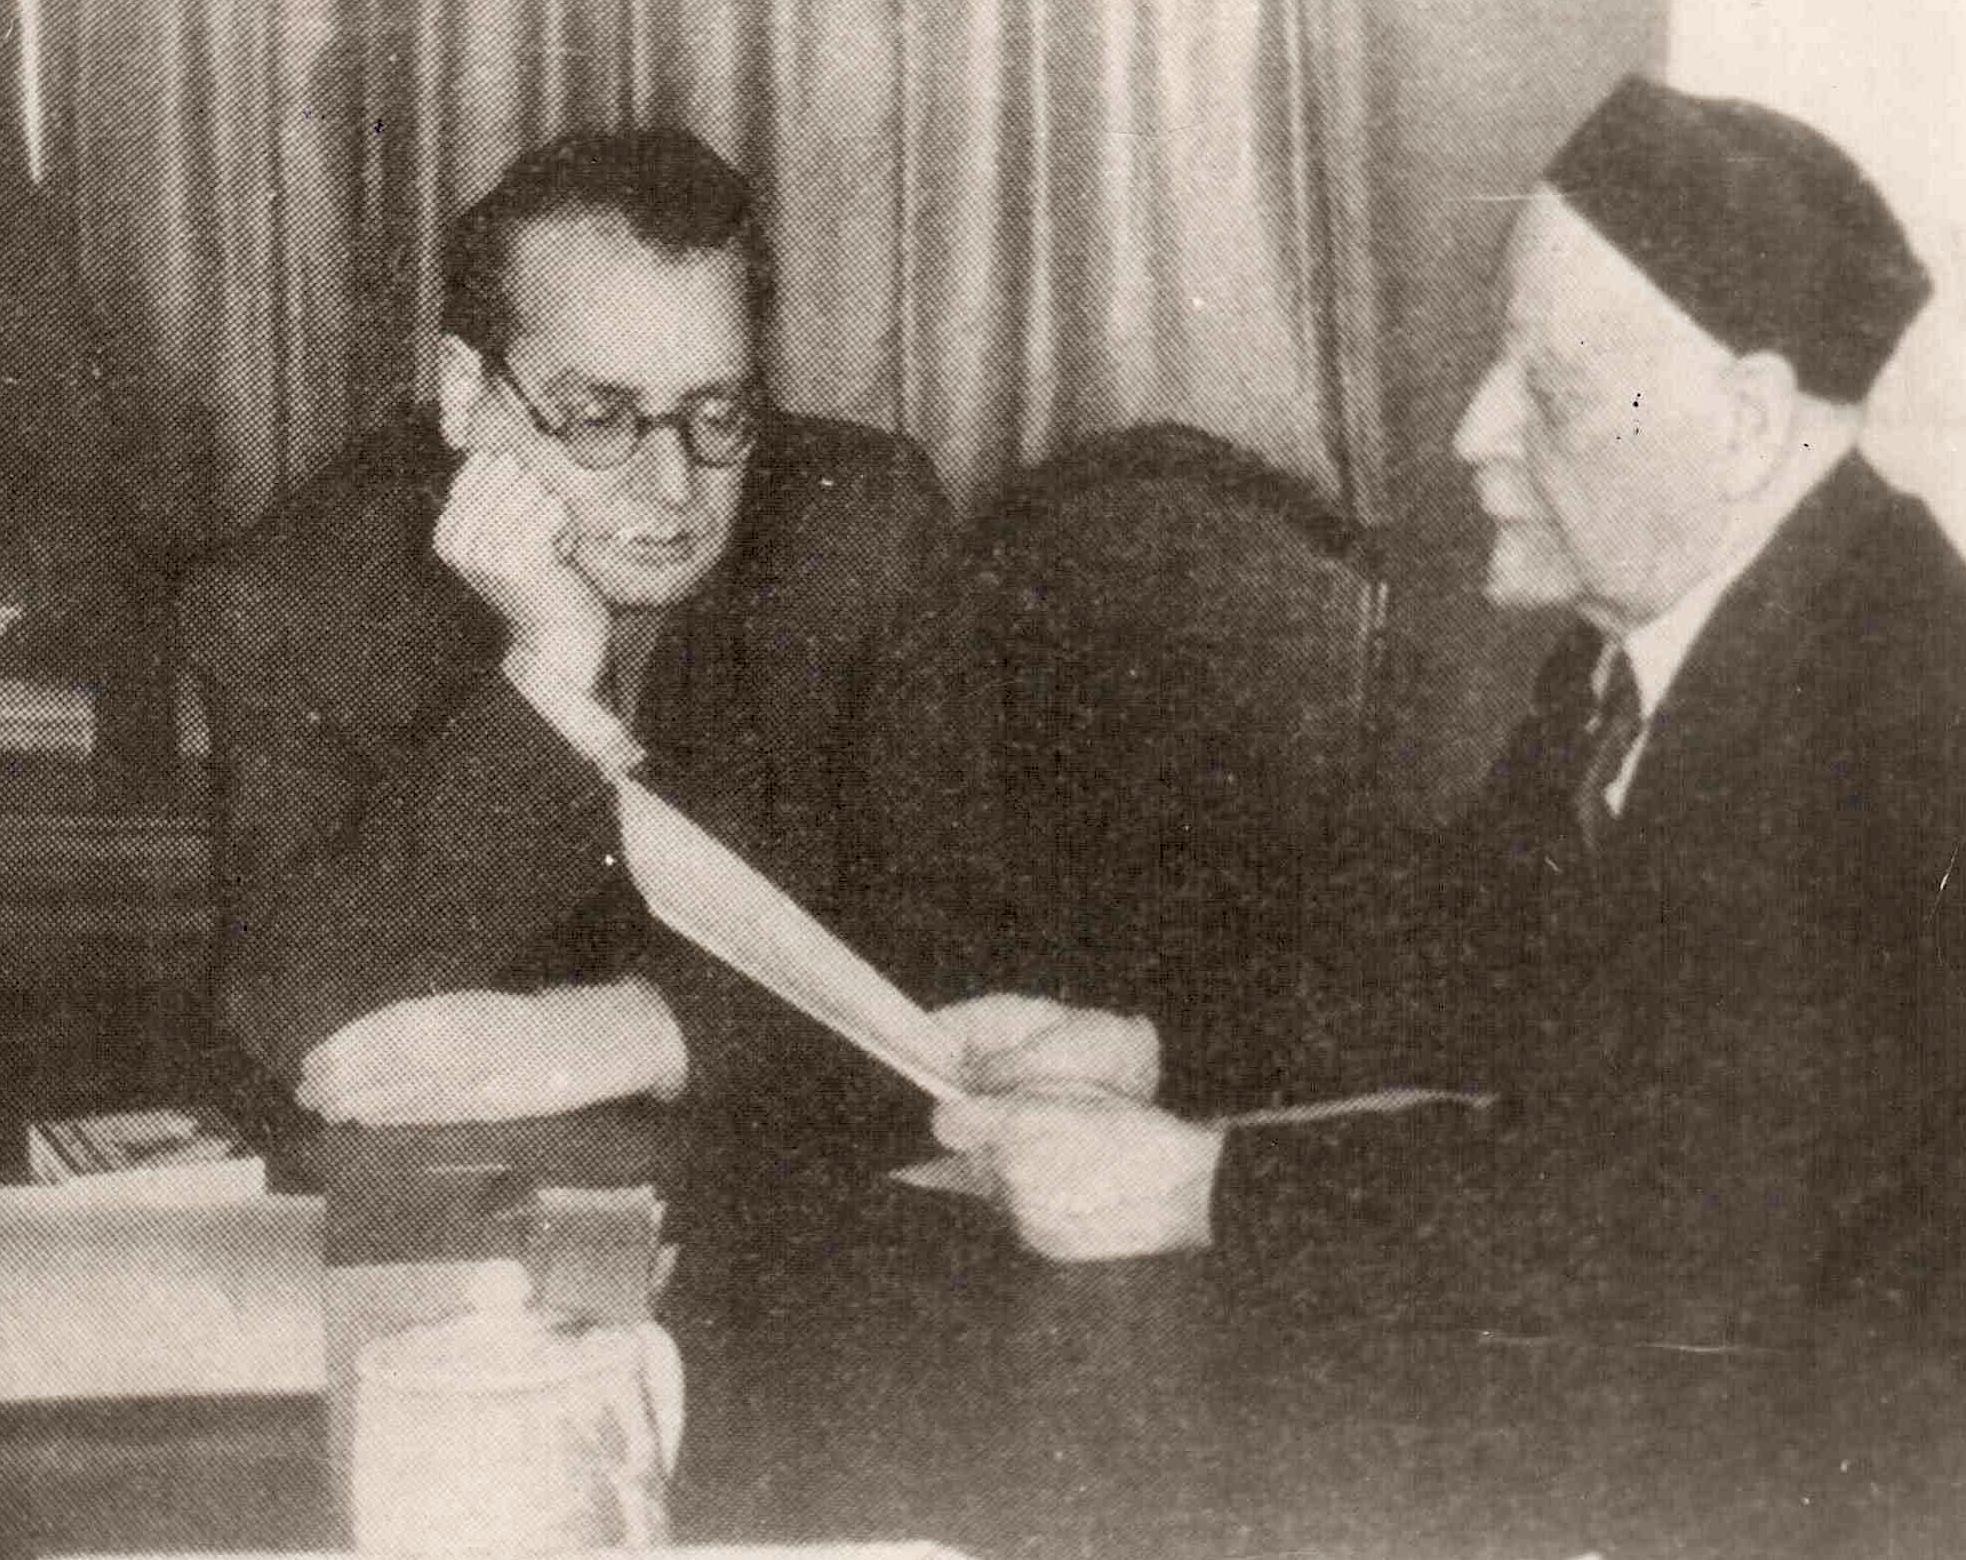 Кржижановский и Казакевич. Москва, 1951 год. <br>